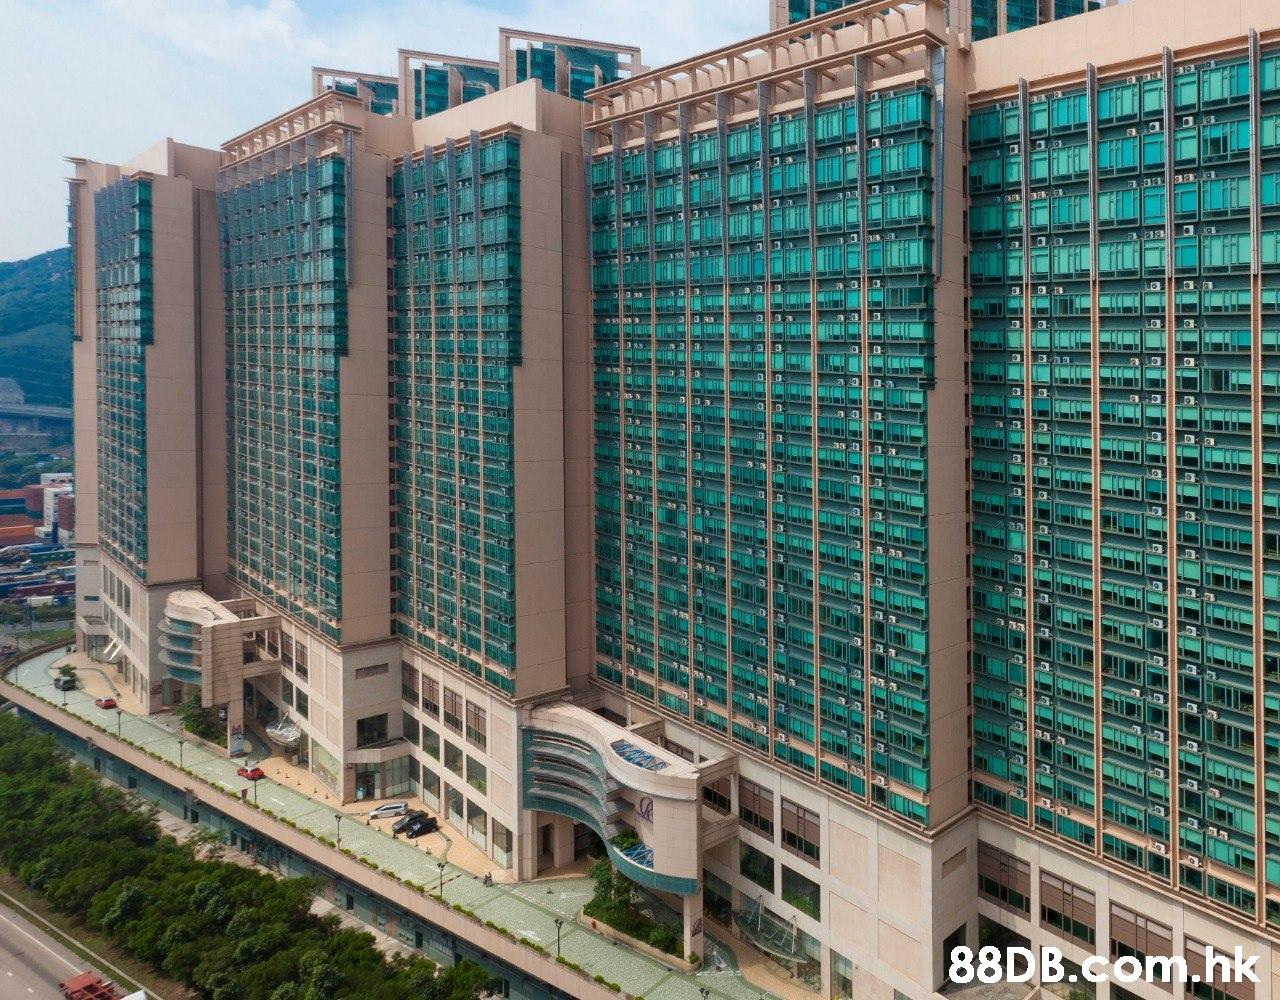 88DB.Com.k  Metropolitan area,Condominium,Building,Tower block,Property